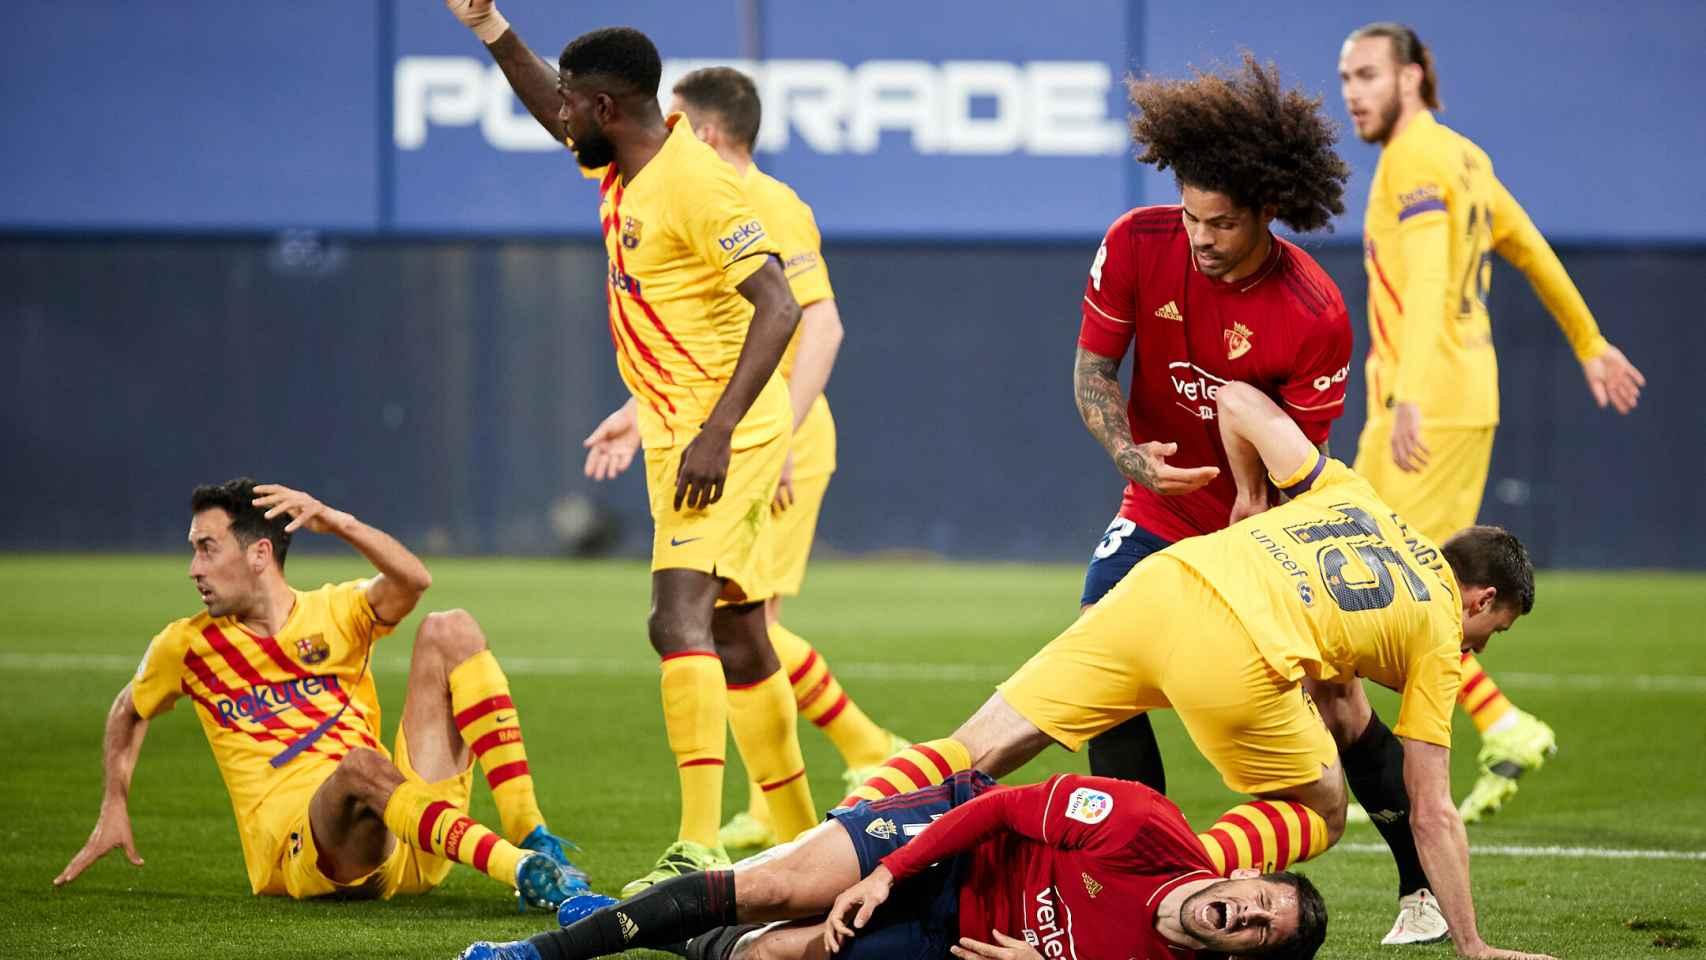 La defensa del Barça despeja un balón